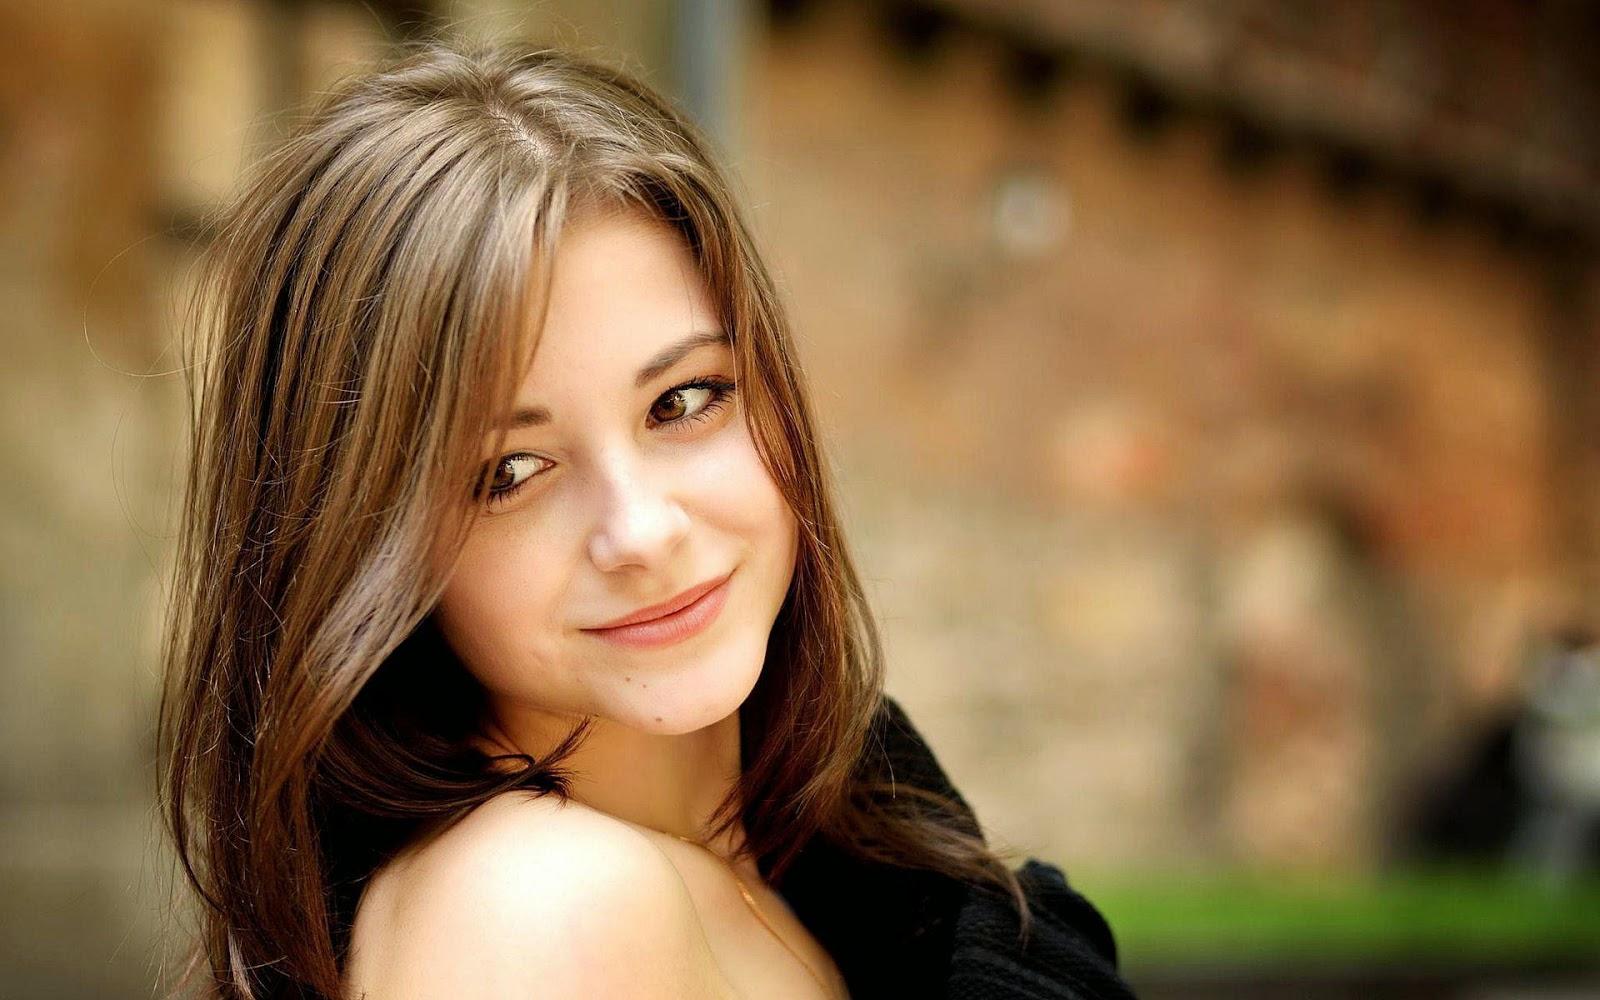 beautiful girl - photo #2